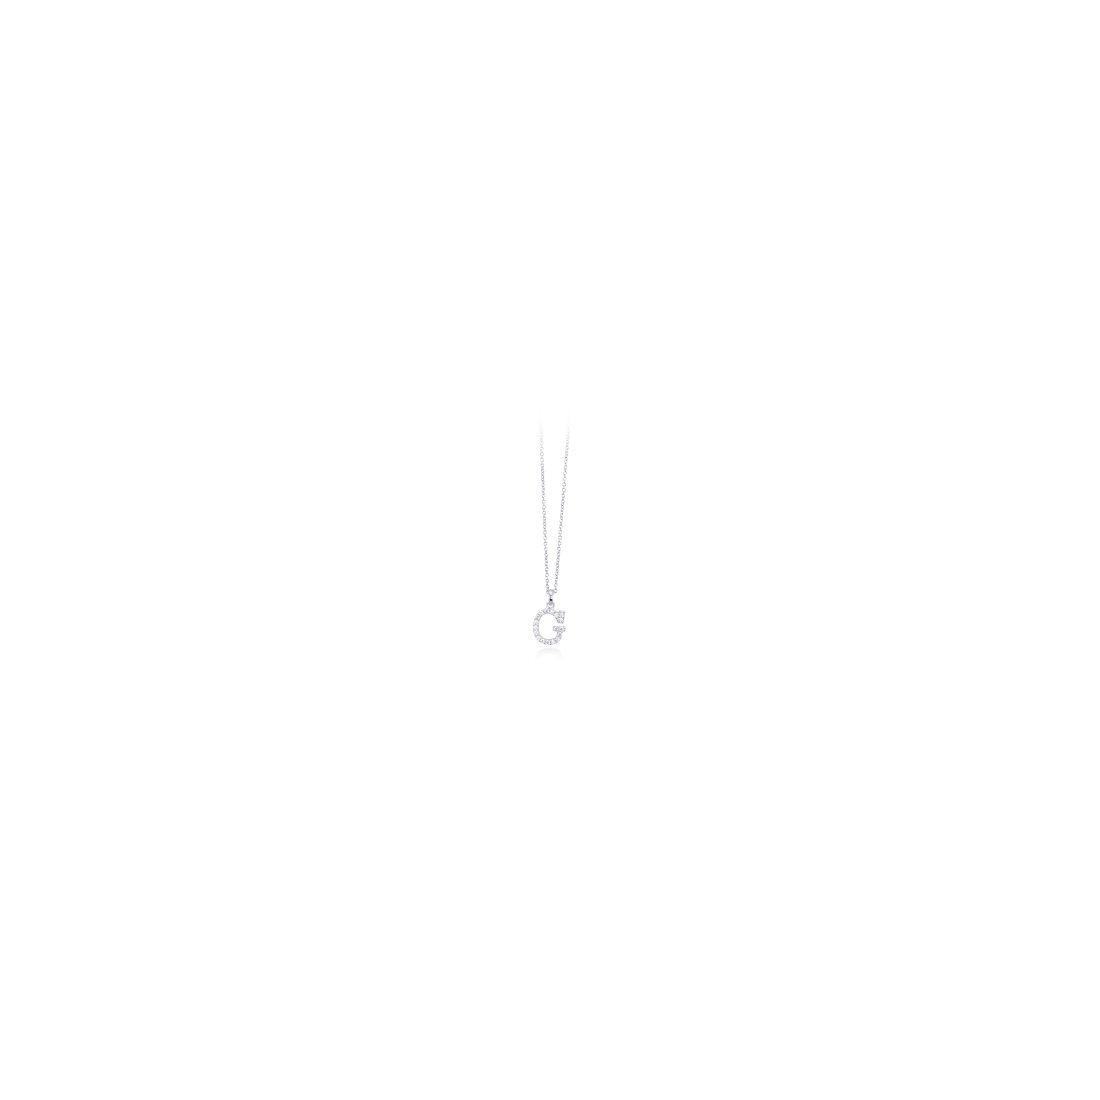 Mabina 553168G collana iniziali argento con zirconi bianchi